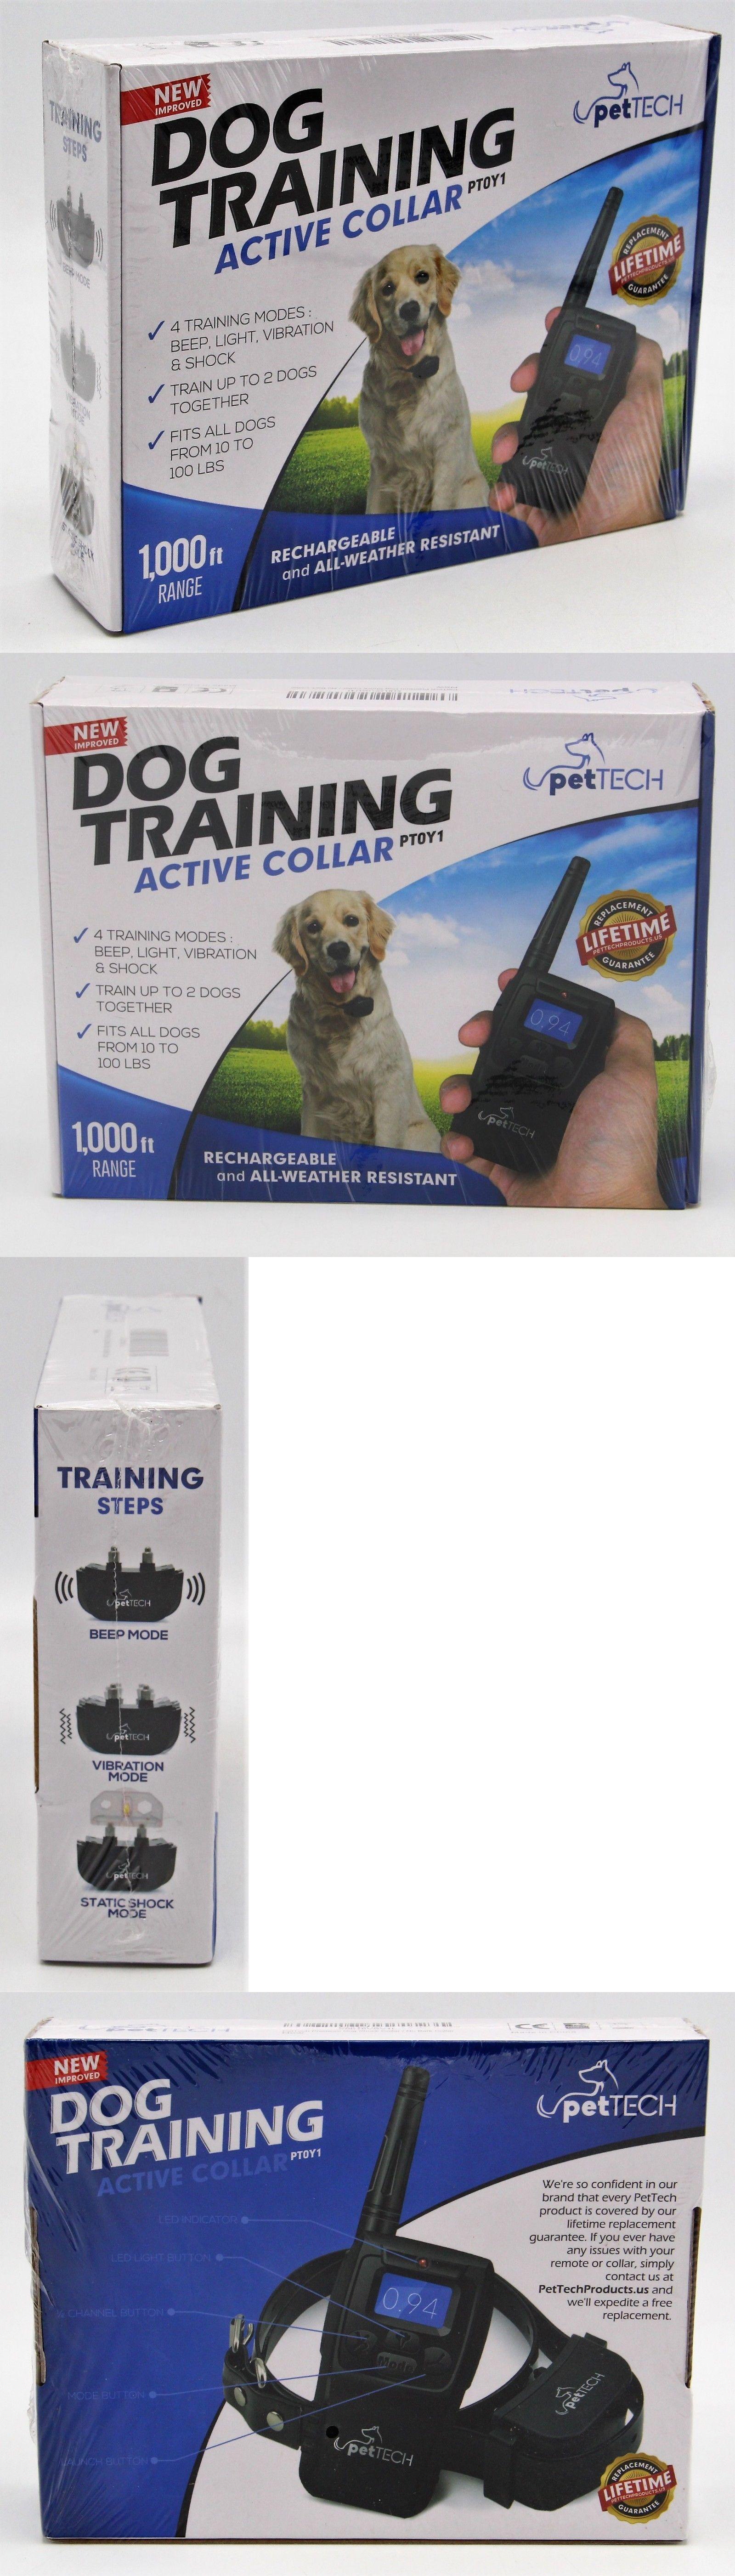 Bark Collars 66774 Pet Dog Training Collar Rechargeable Electric